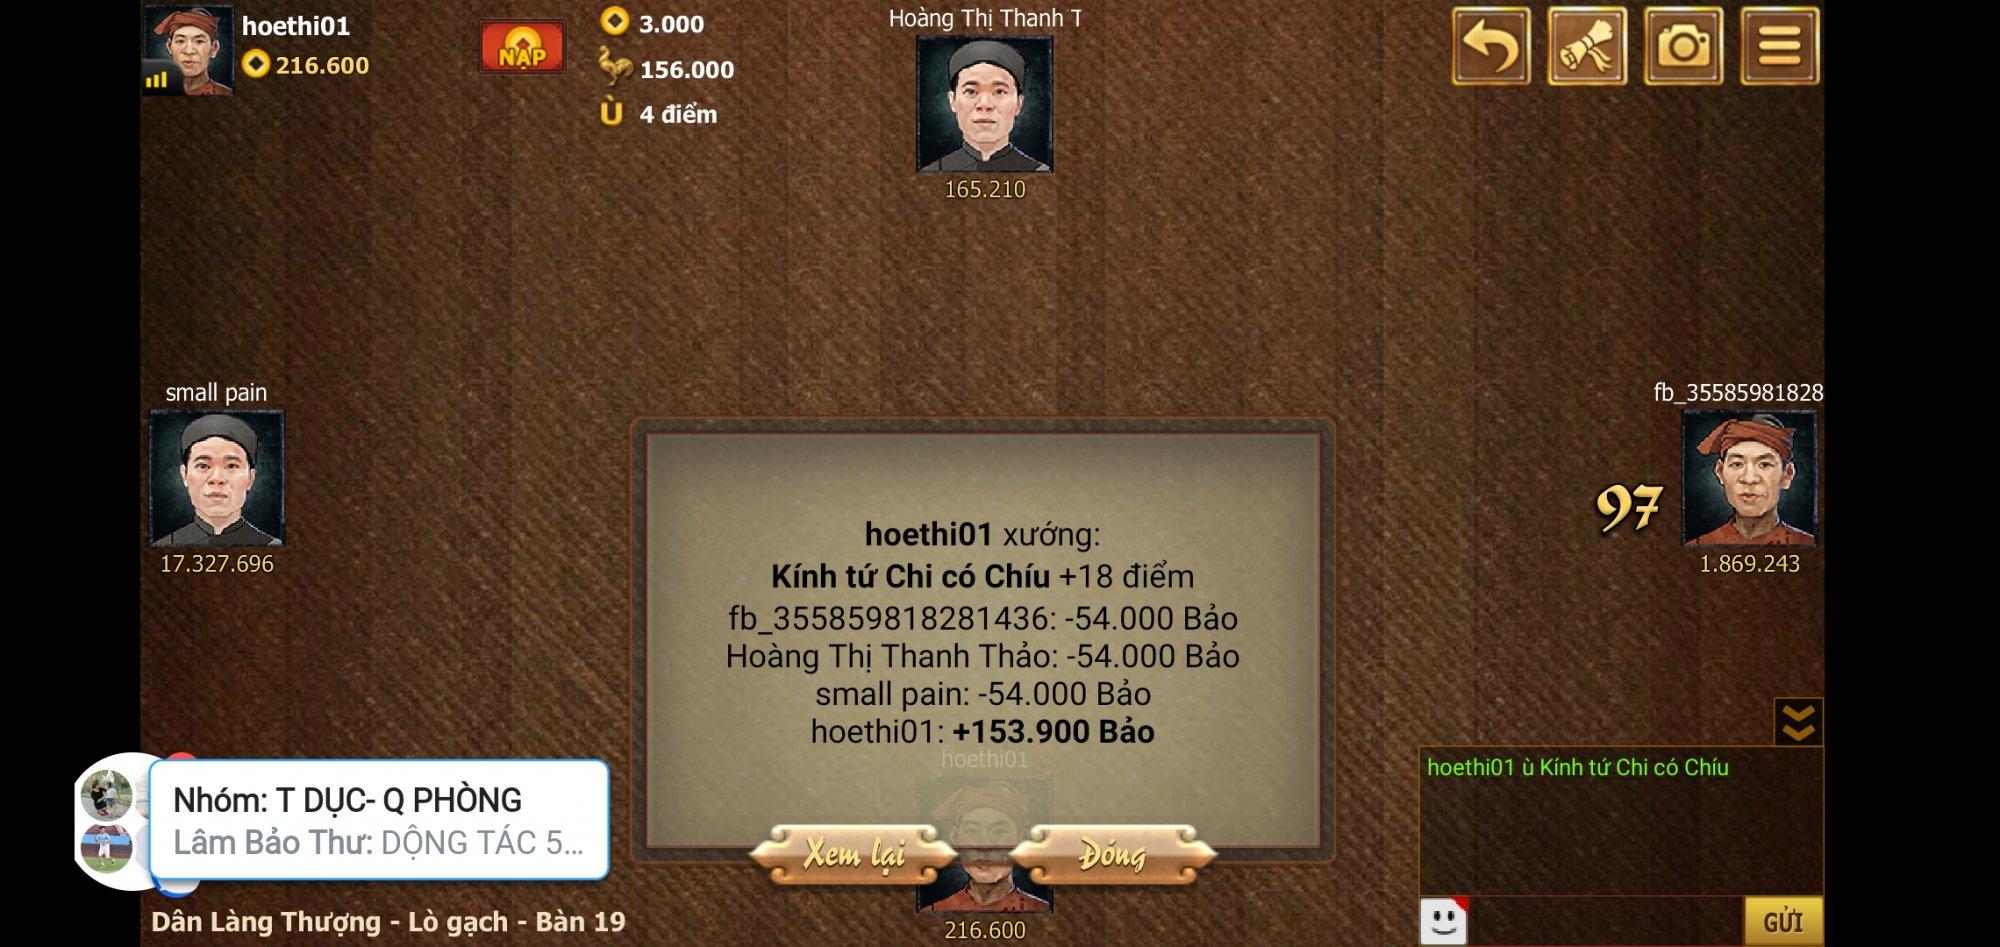 Screenshot_20200402-125921_Chn Sn nh.